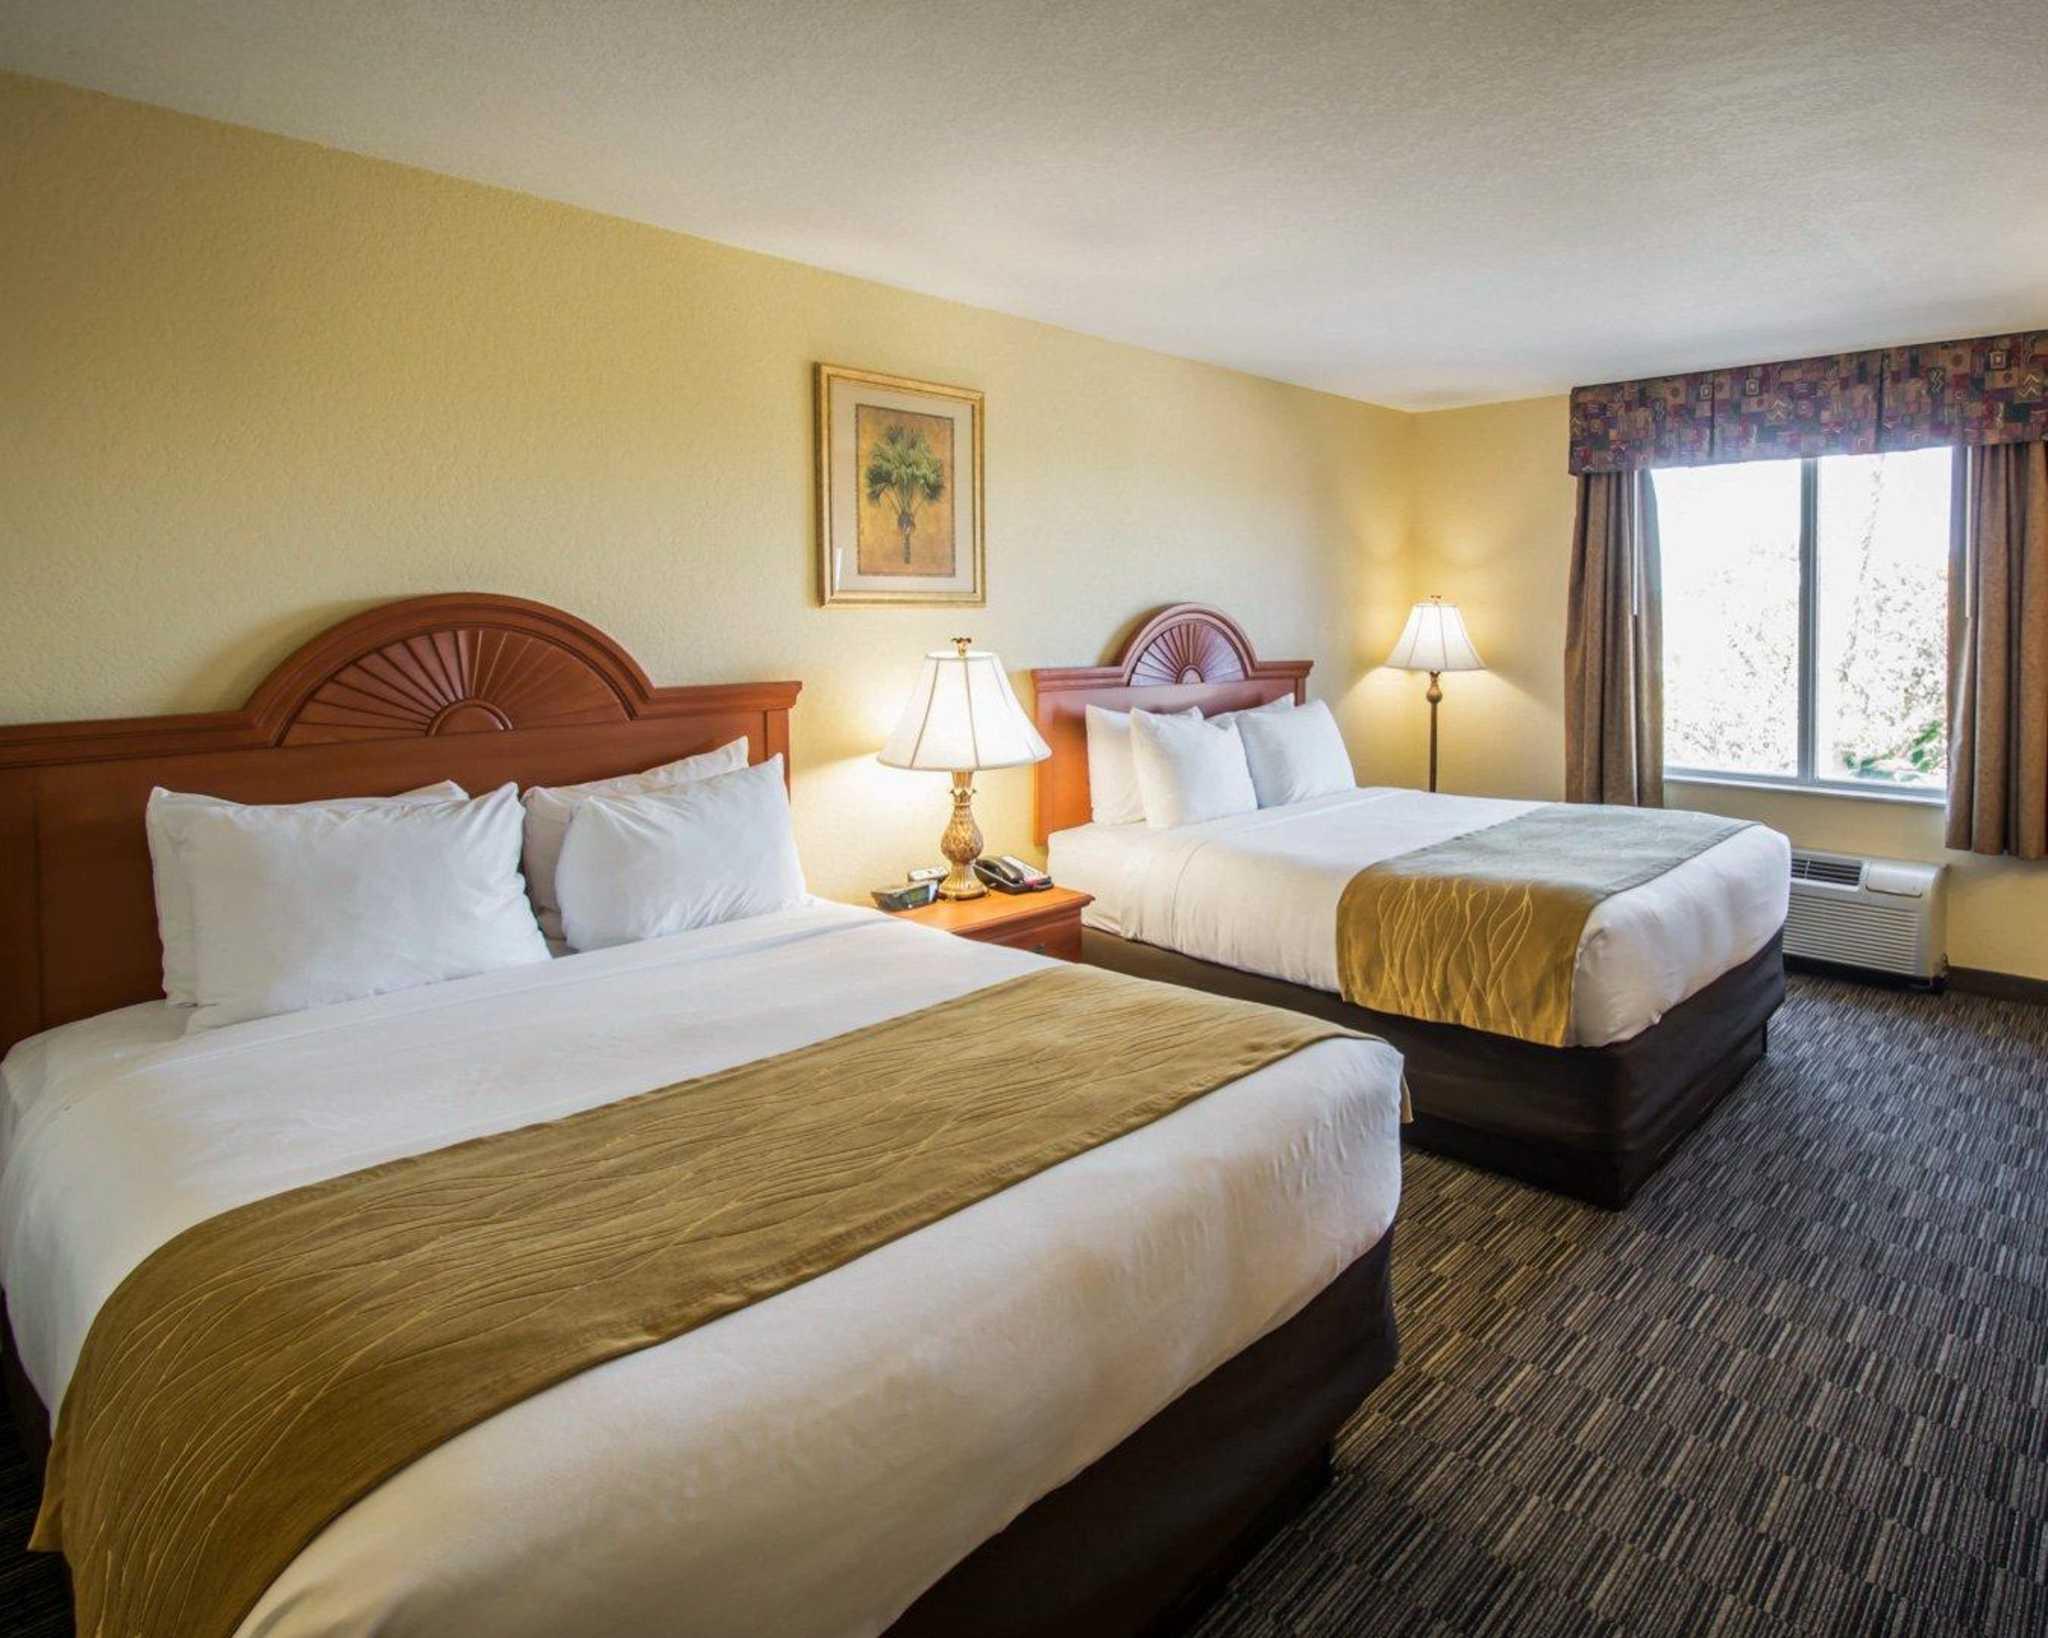 Comfort Inn Amp Suites Coupons Jupiter Fl Near Me 8coupons